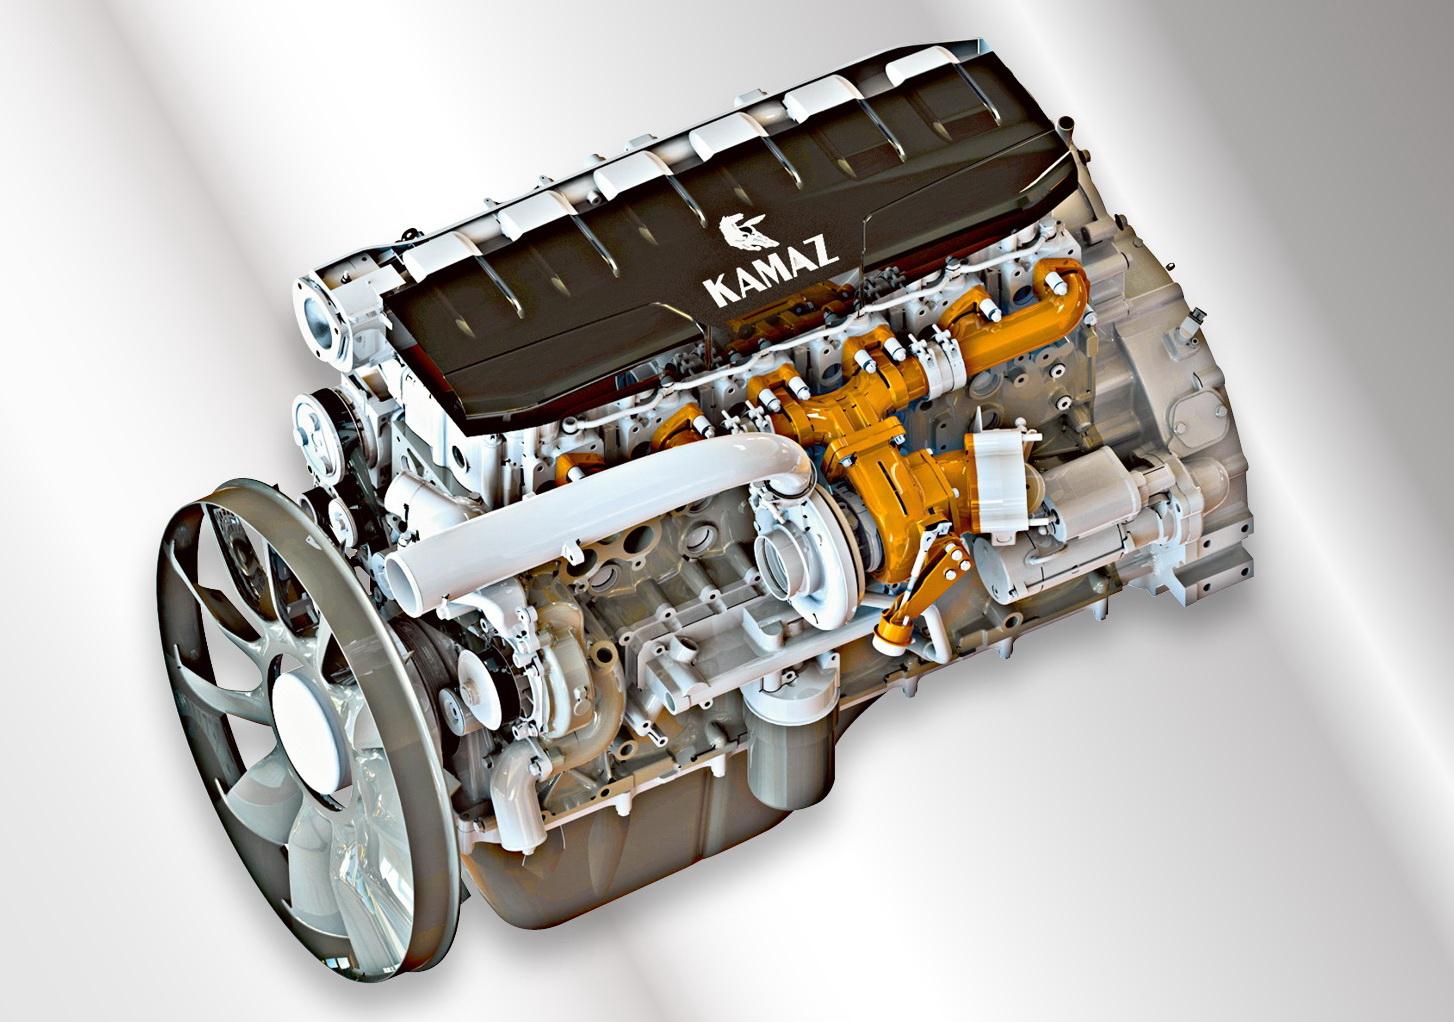 КАМАЗ‑910.10 - перспективный дизельный мотор - журнал За рулем